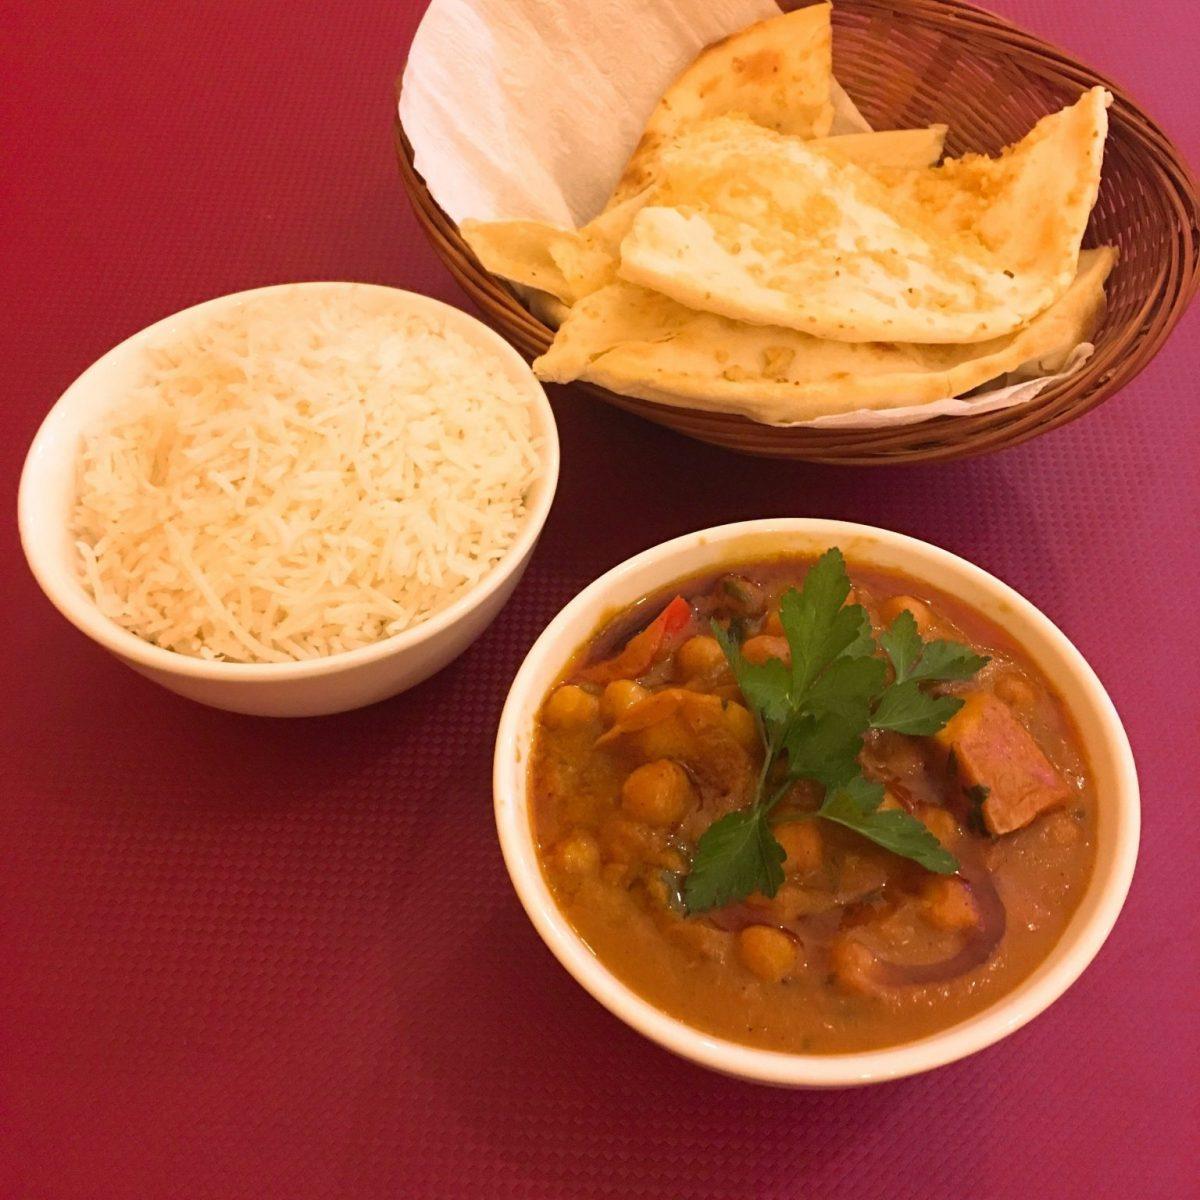 Vegan Indian food at Anki's